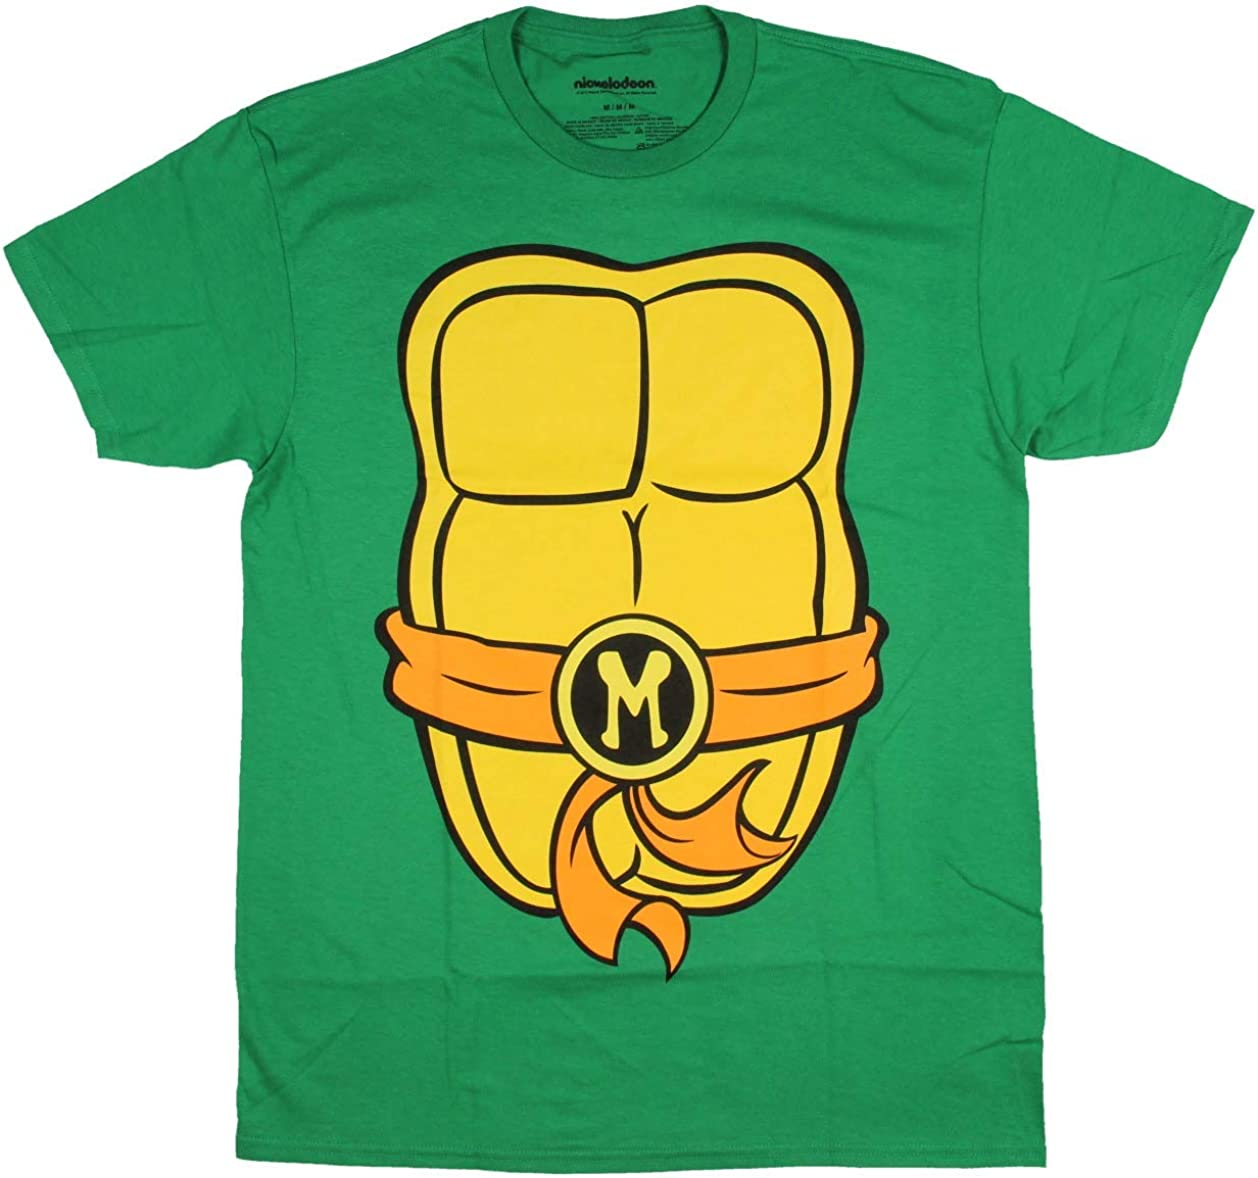 Teenage Mutant Ninja Turtles TMNT Mens Costume T-Shirt (Medium, Michelangelo) by Nickelodeon